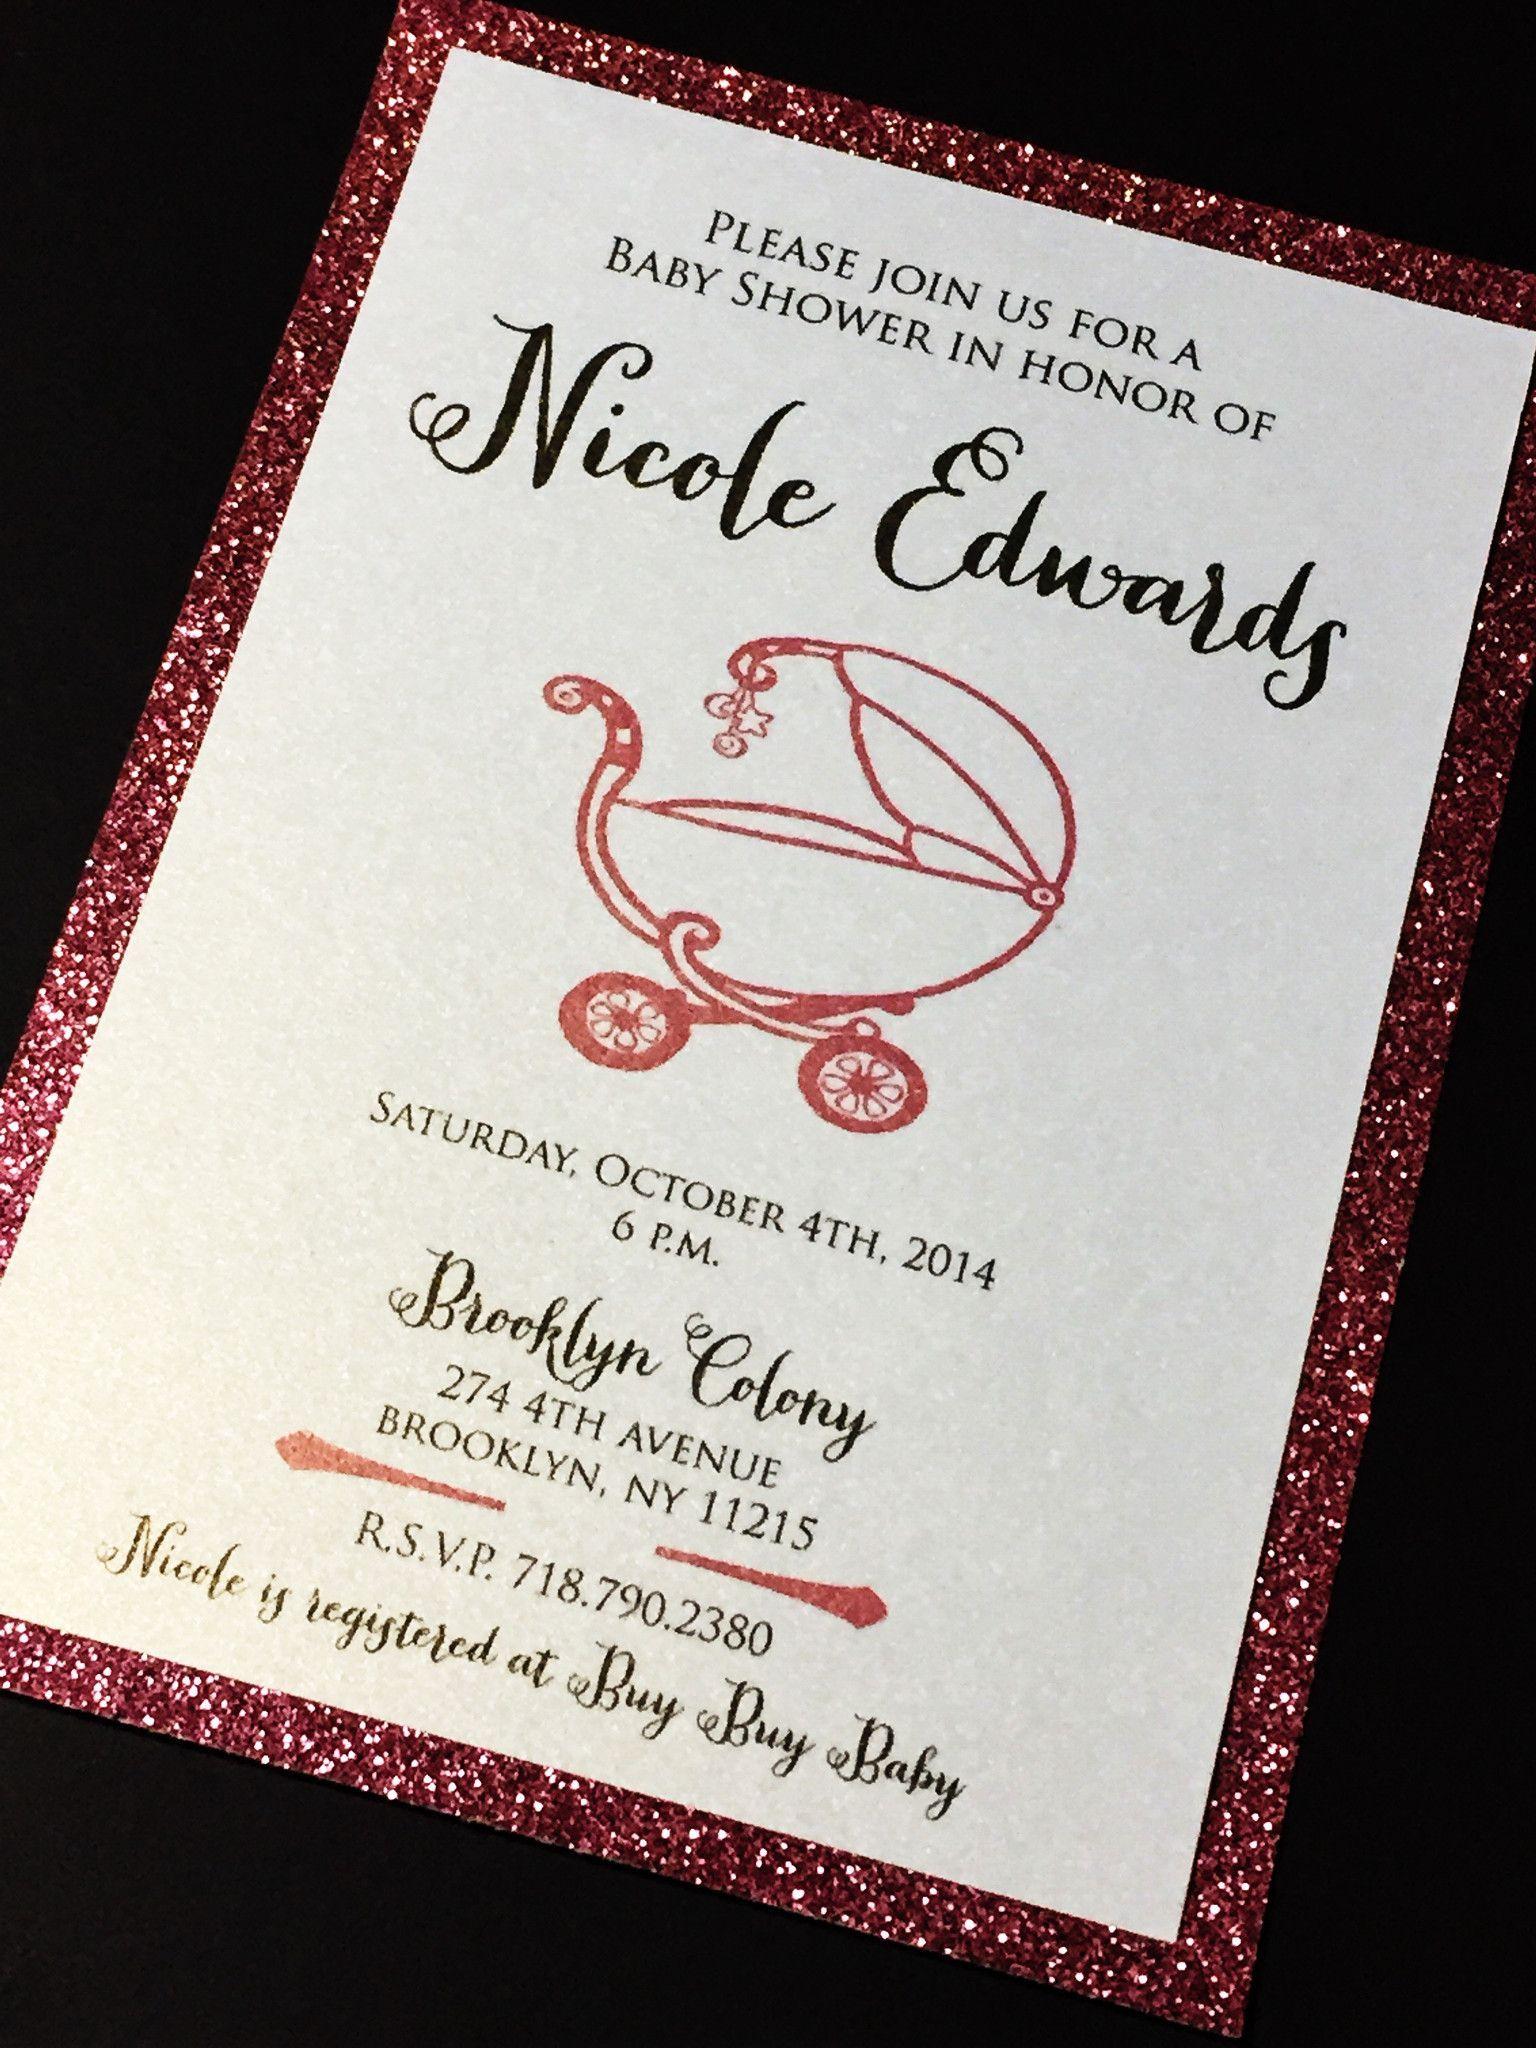 Glitter Baby Shower Invitations, Elegant Baby Shower Invite NICOLE ...